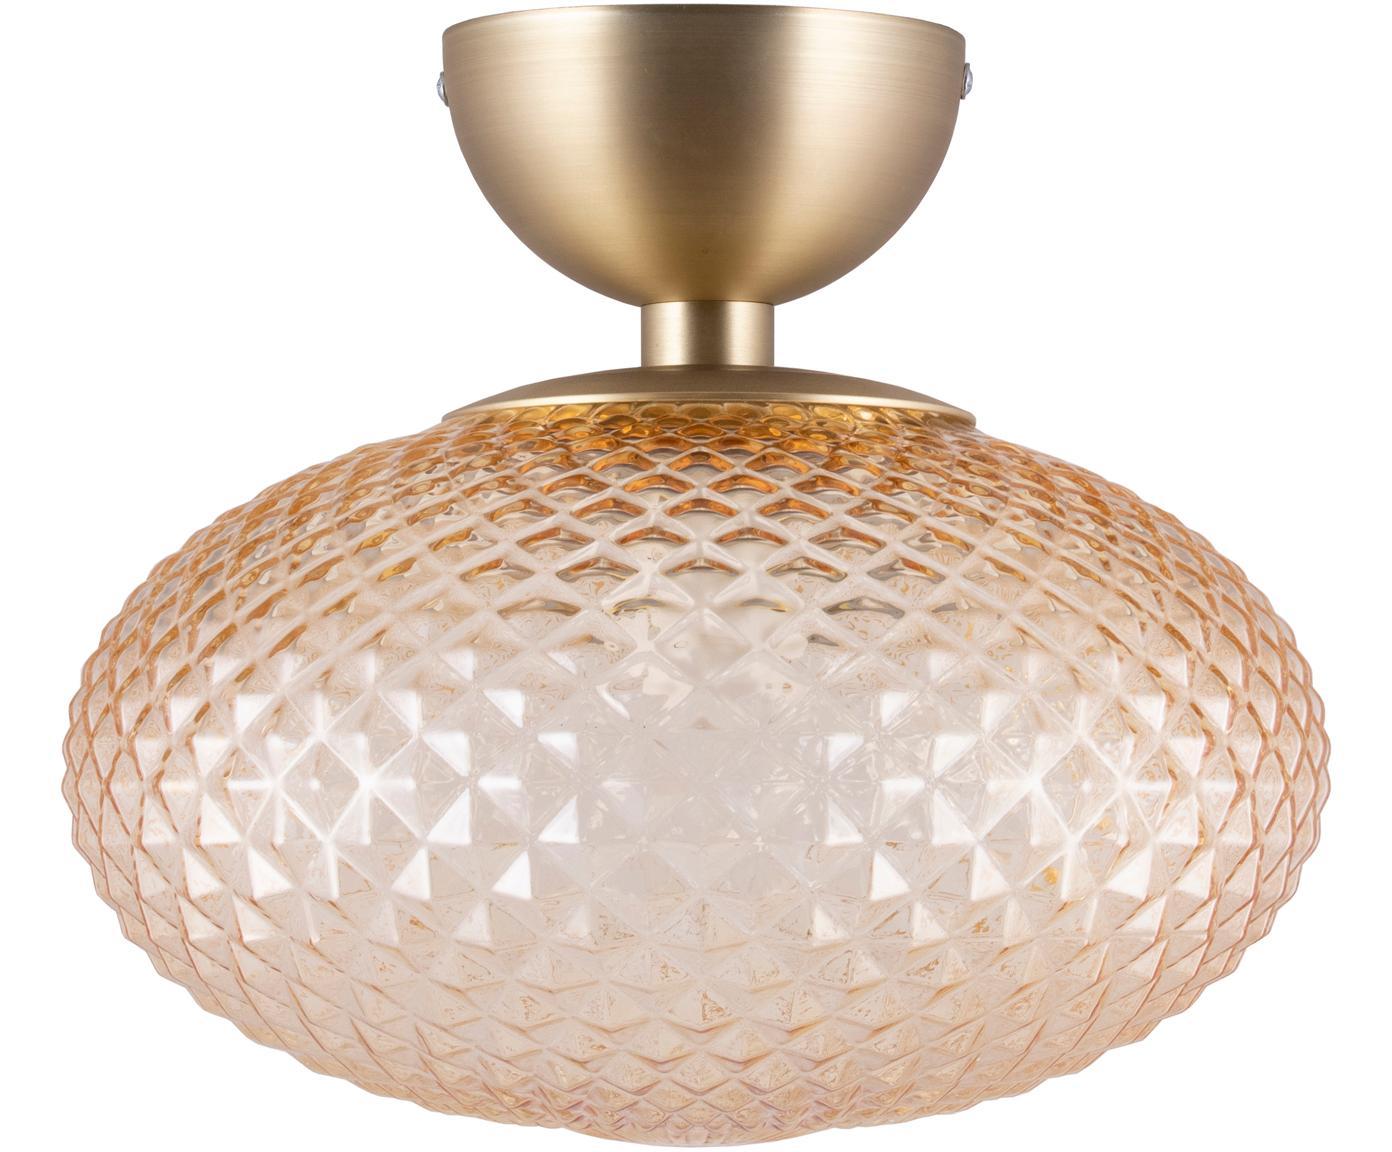 Plafoniera Jackson, Paralume: vetro, Ambra, ottone, Ø 28 x Alt. 25 cm